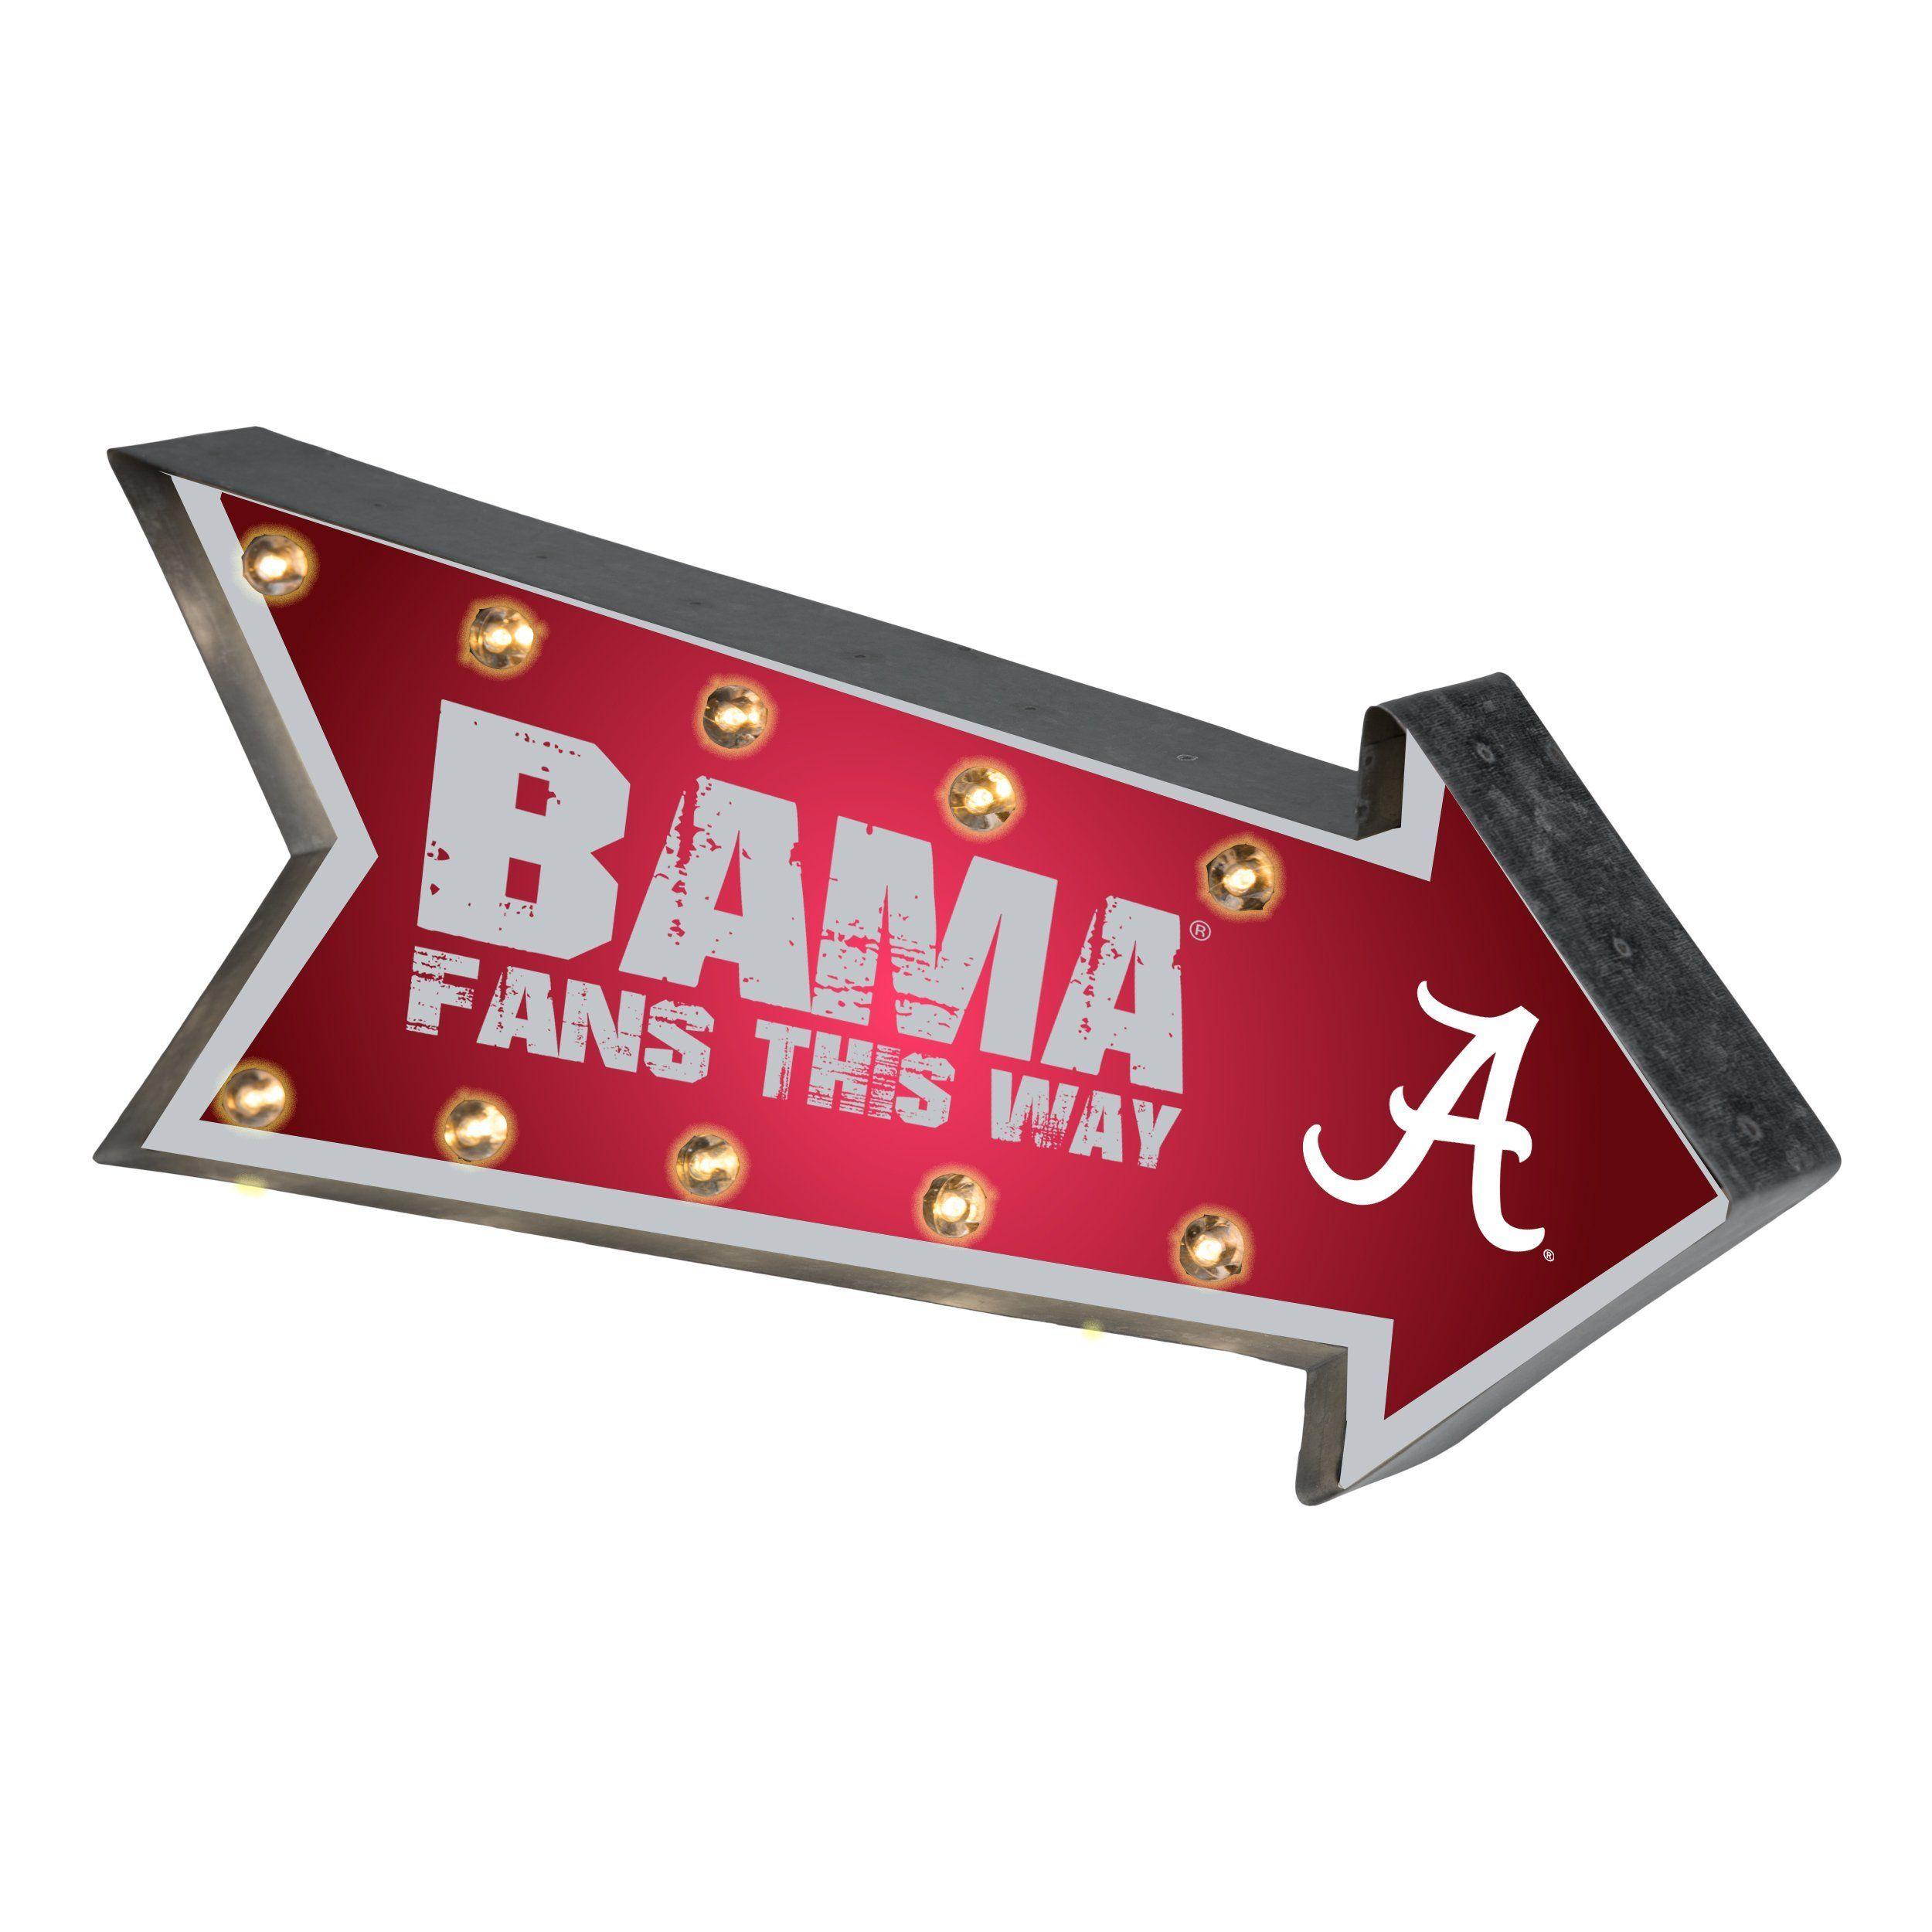 Alabama Crimson Tide Ncaa Marquee Light Up Sign Alabama Crimson Tide Crimson Tide Arrow Design